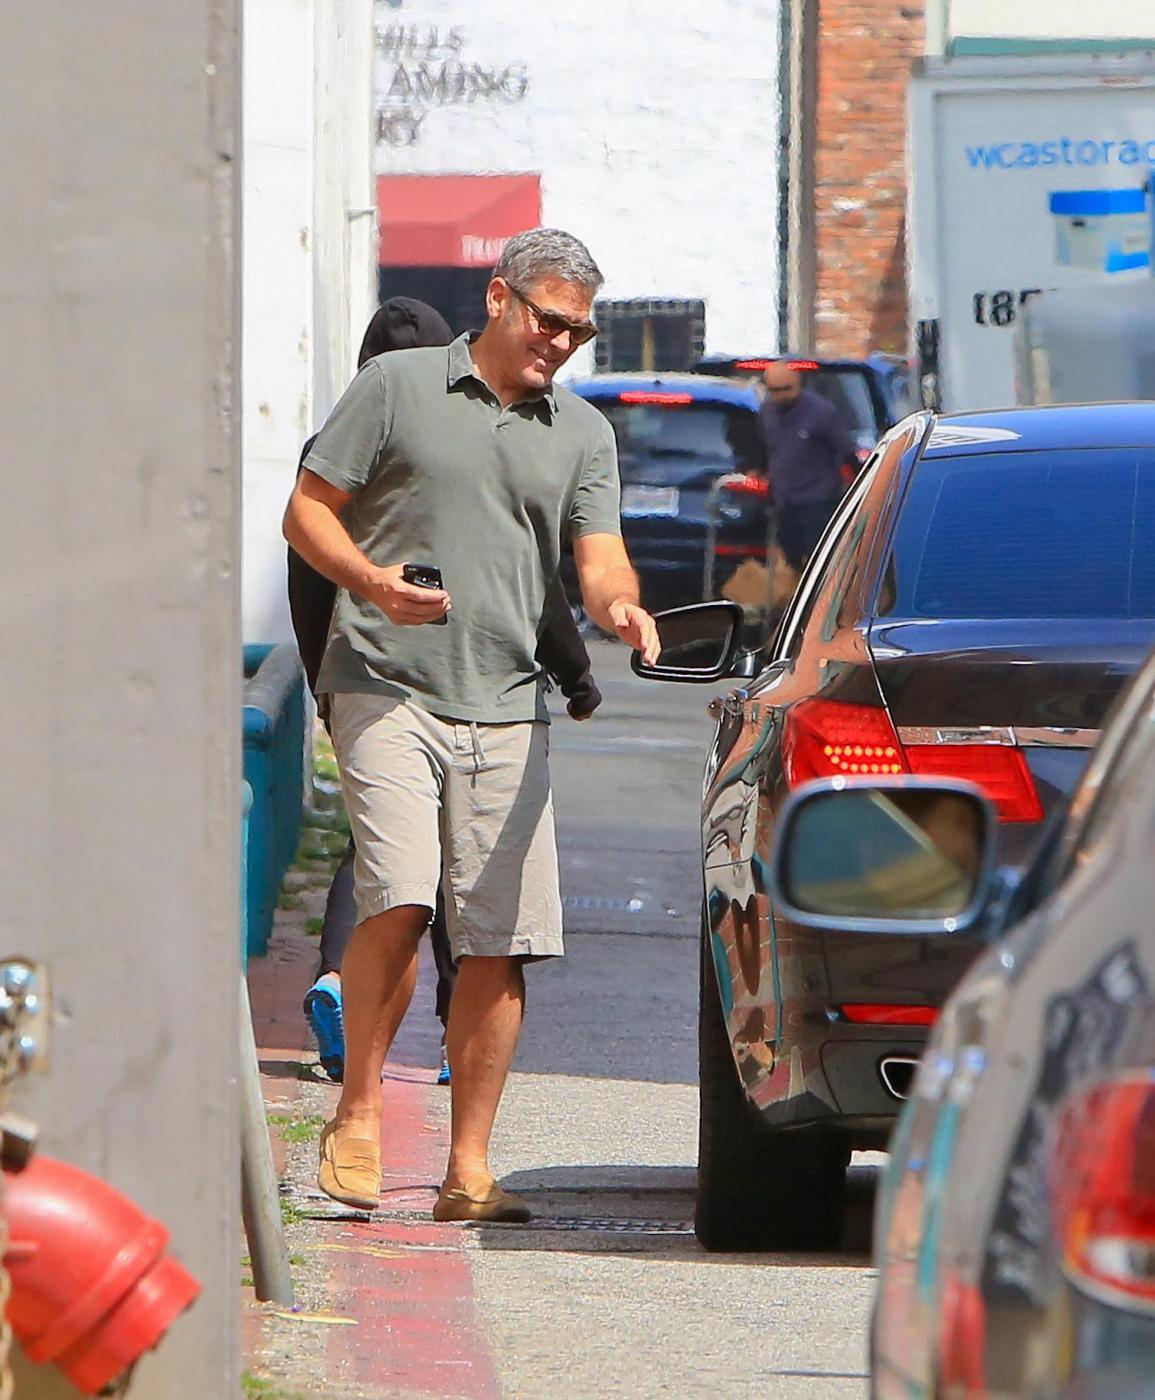 George Clooney, pantaloni corti e mocassini in giro per Beverly Hills FOTO 11